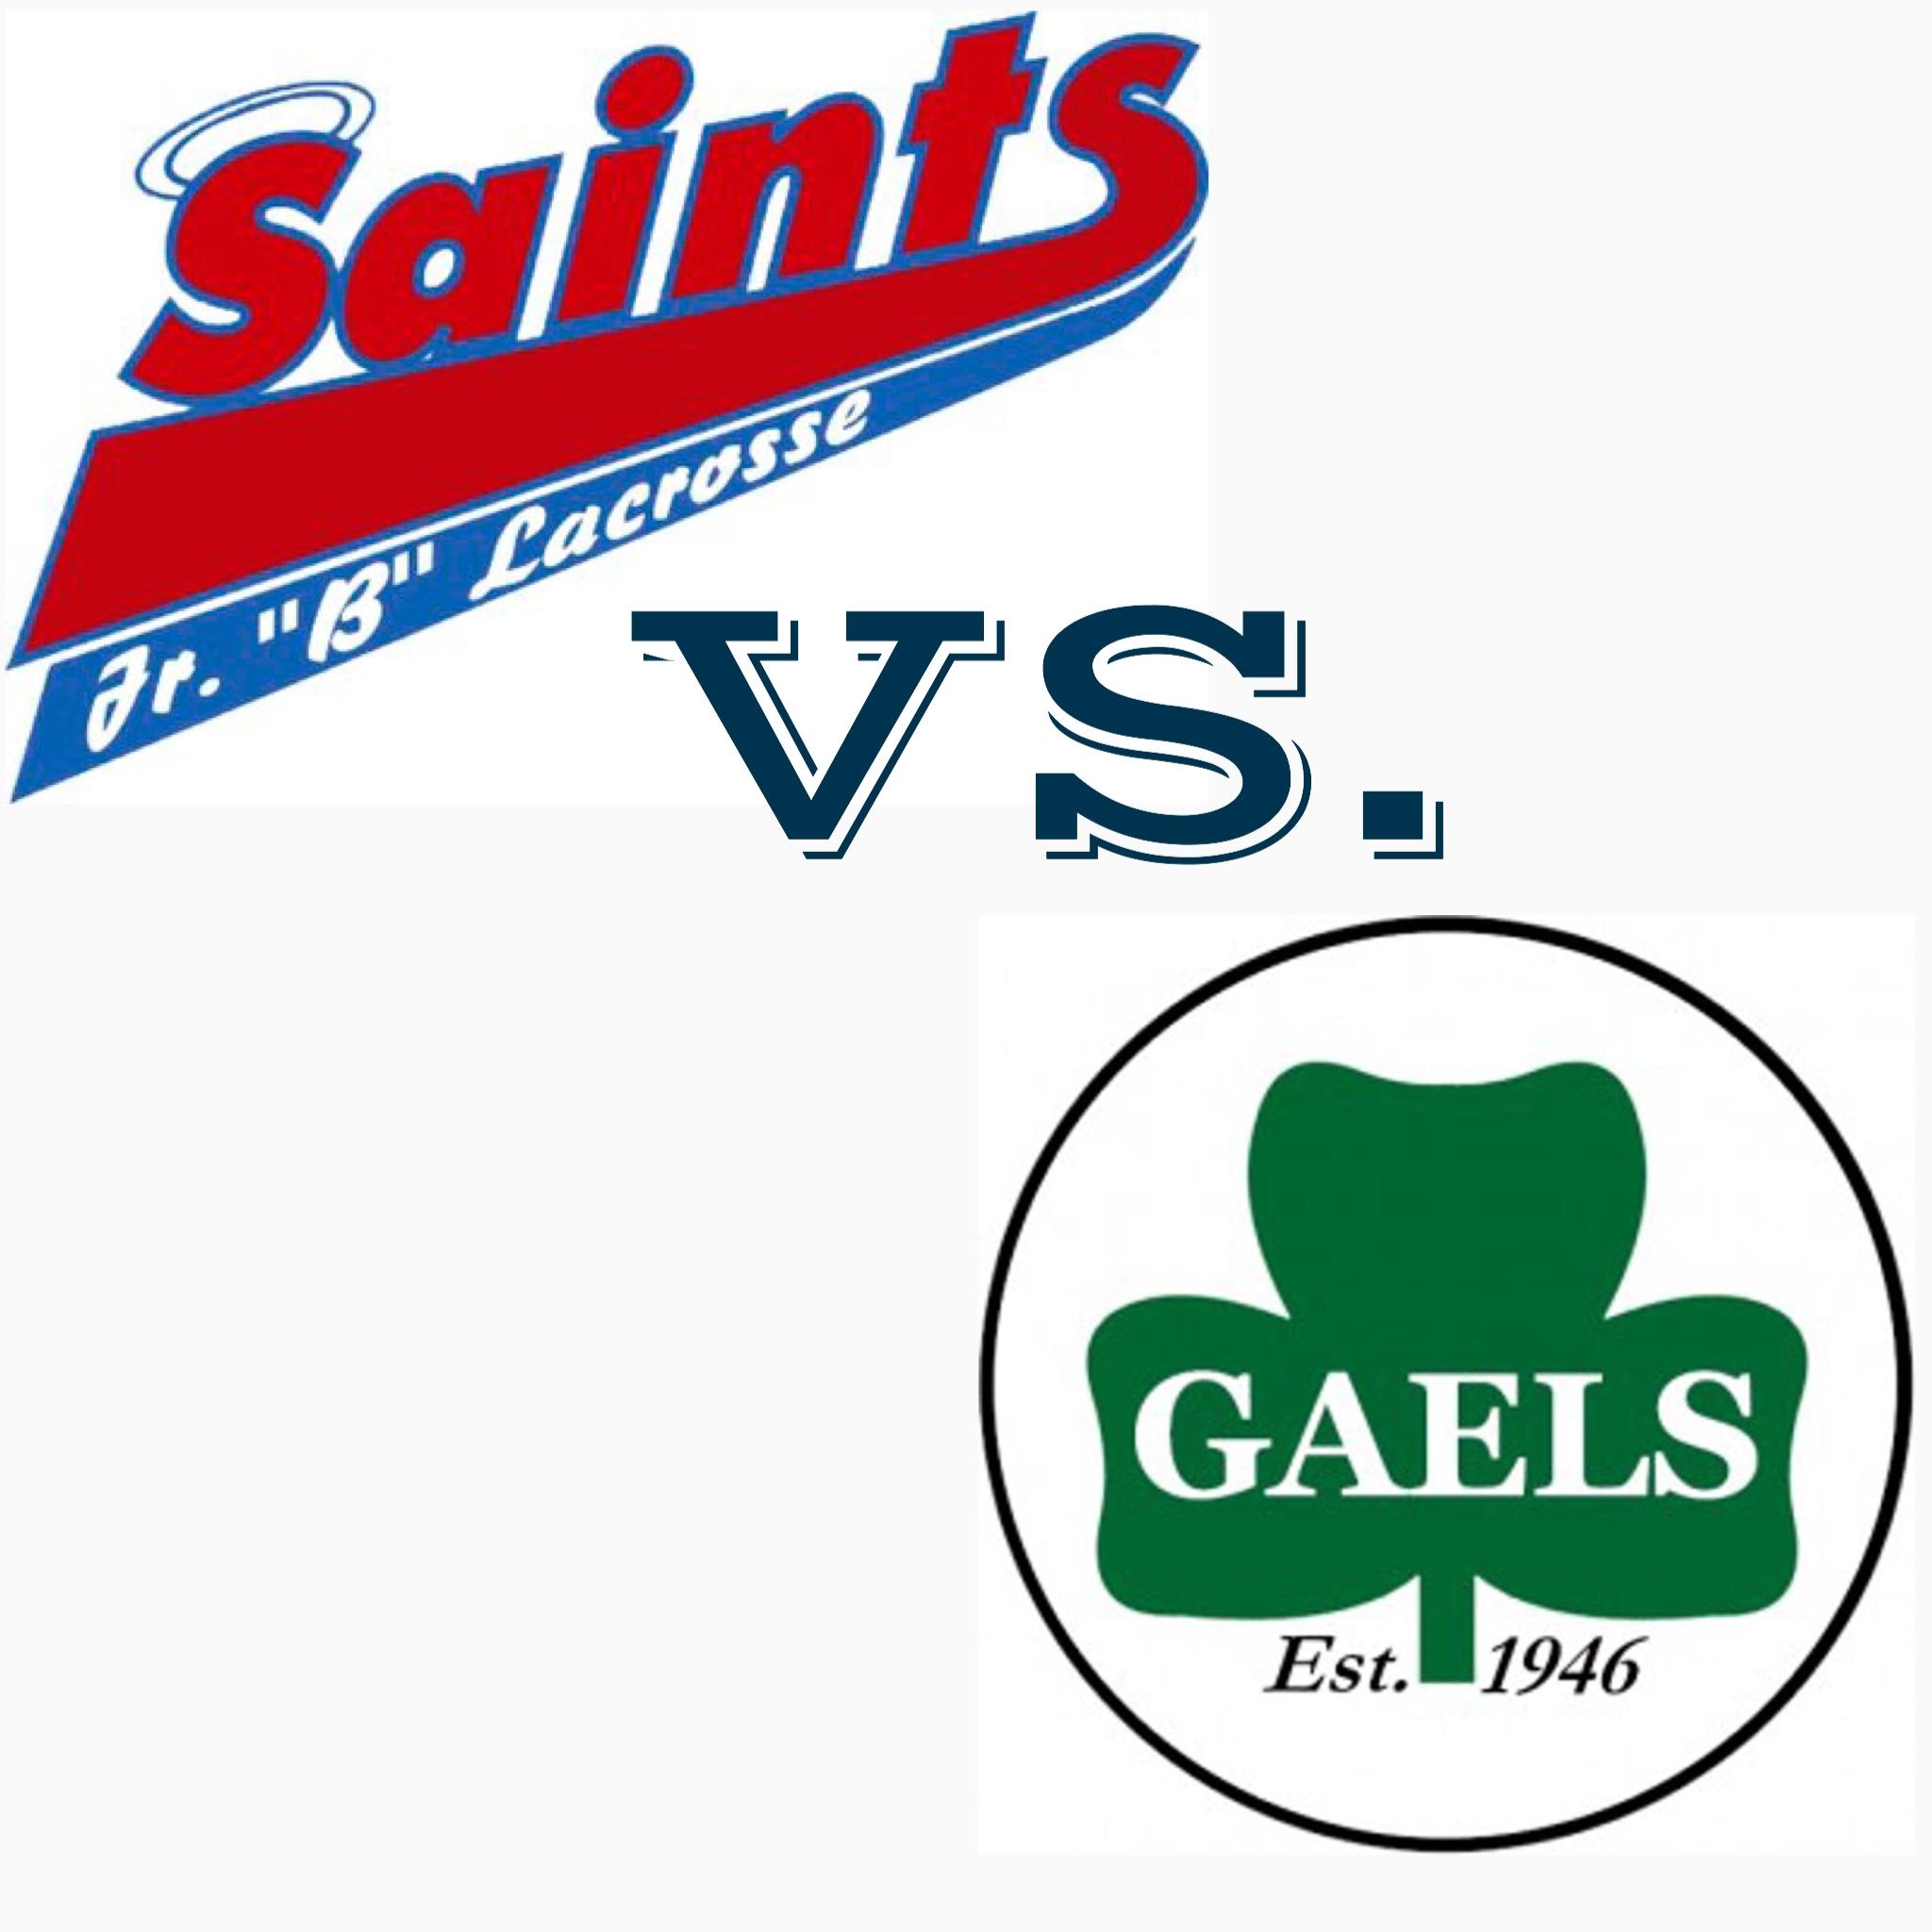 Saints Vs. Gaels.jpg